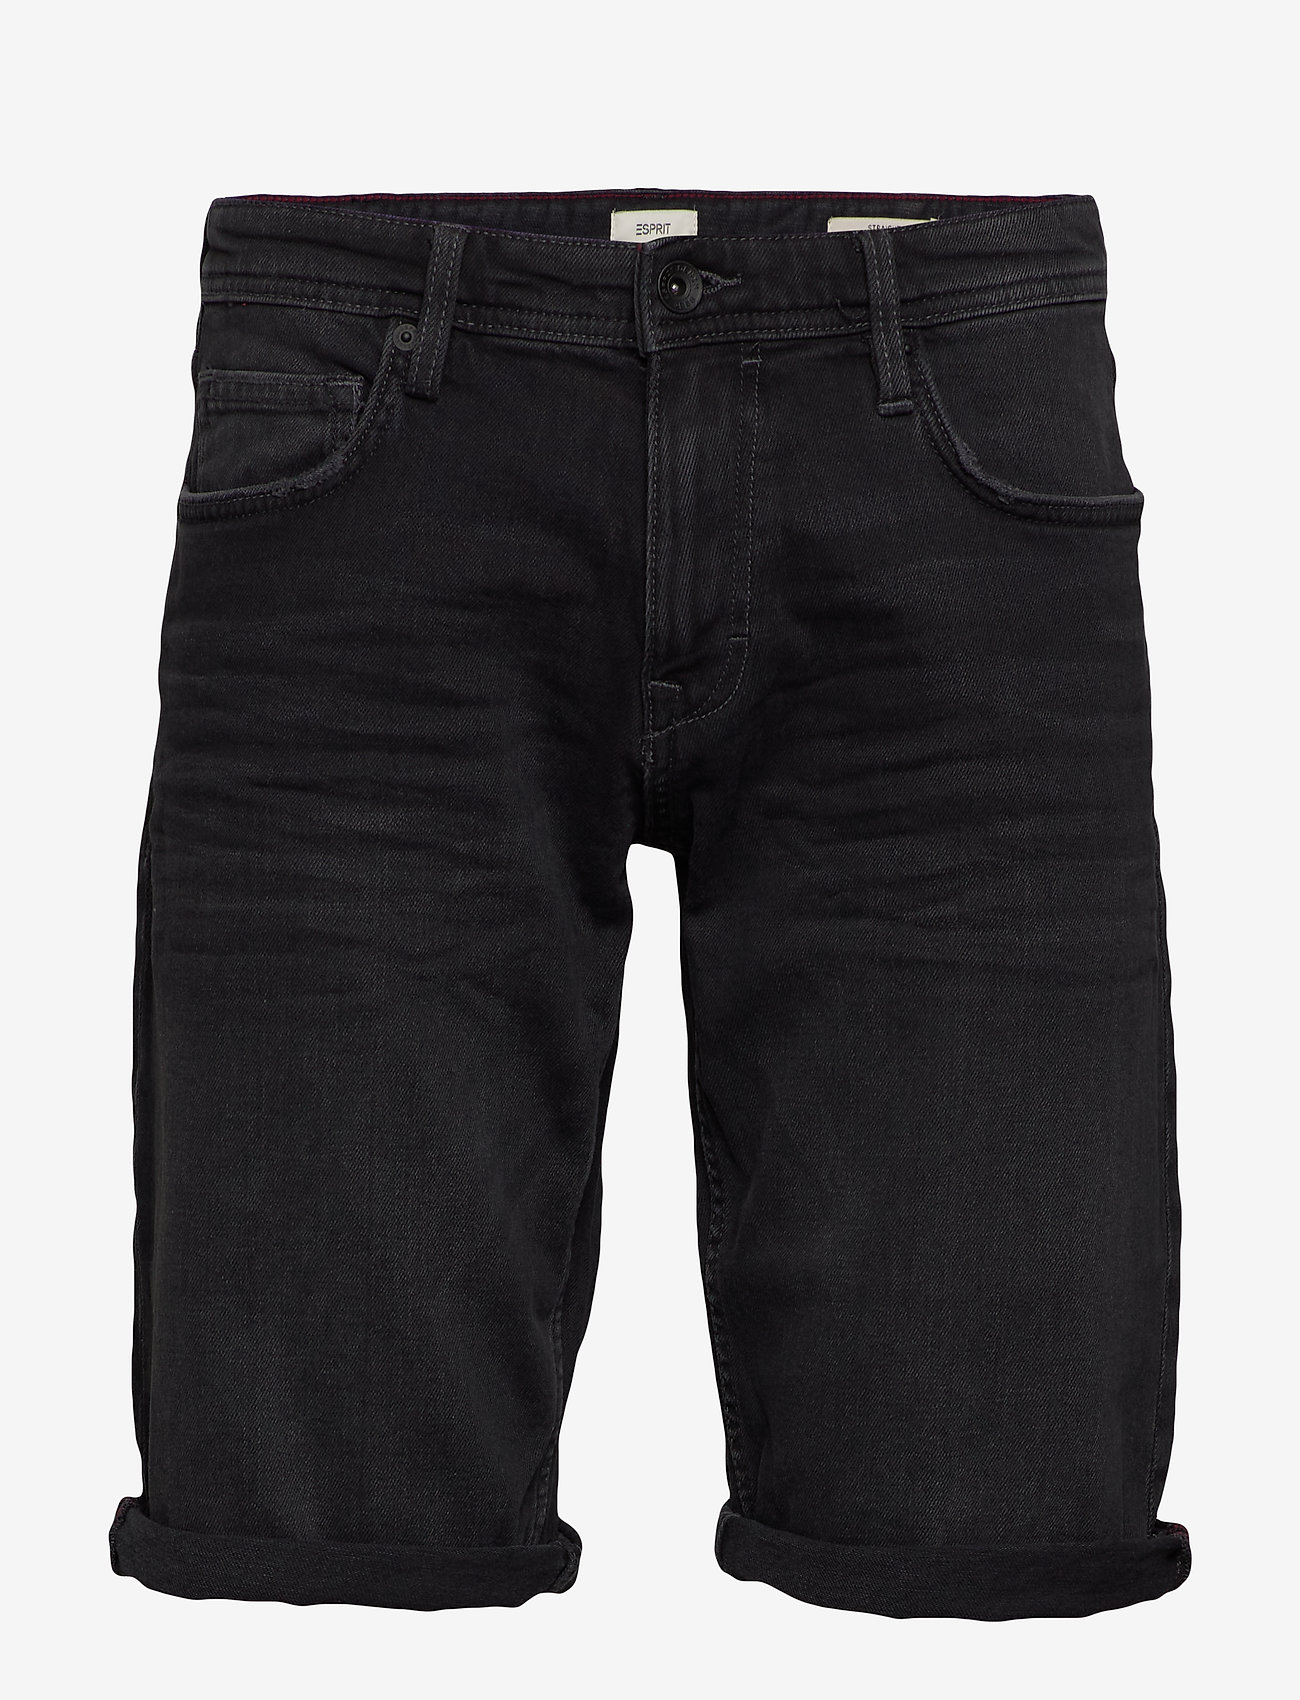 Esprit Casual - Shorts denim - denim shorts - black medium wash - 0